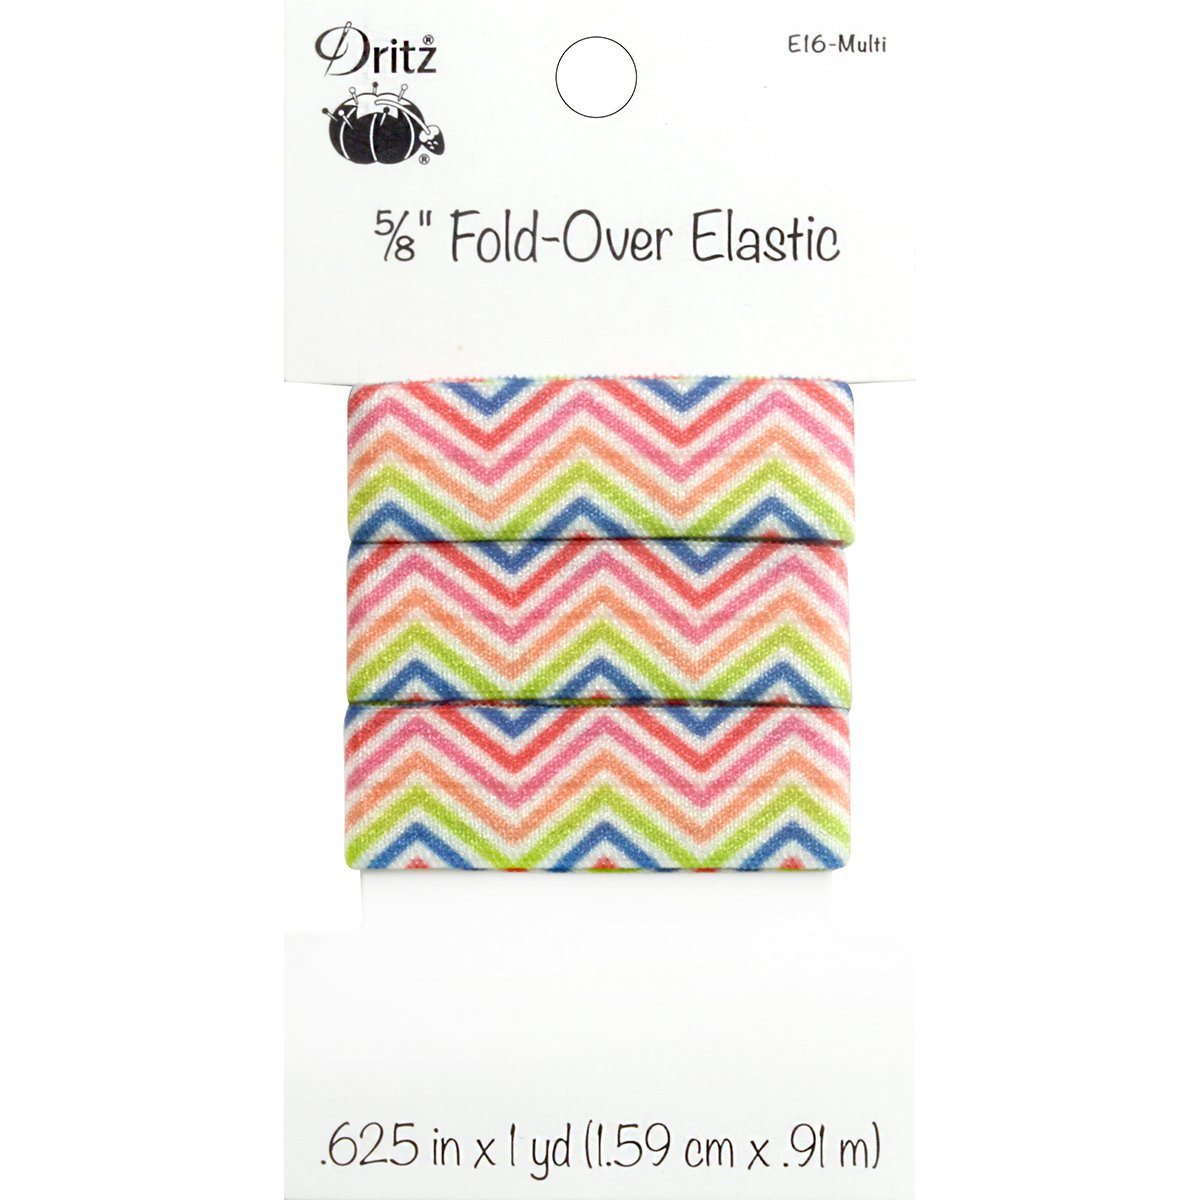 Dritz Chevron Fold-Over Elastic, 5/8 by 1 yd, Multicolor by Dritz